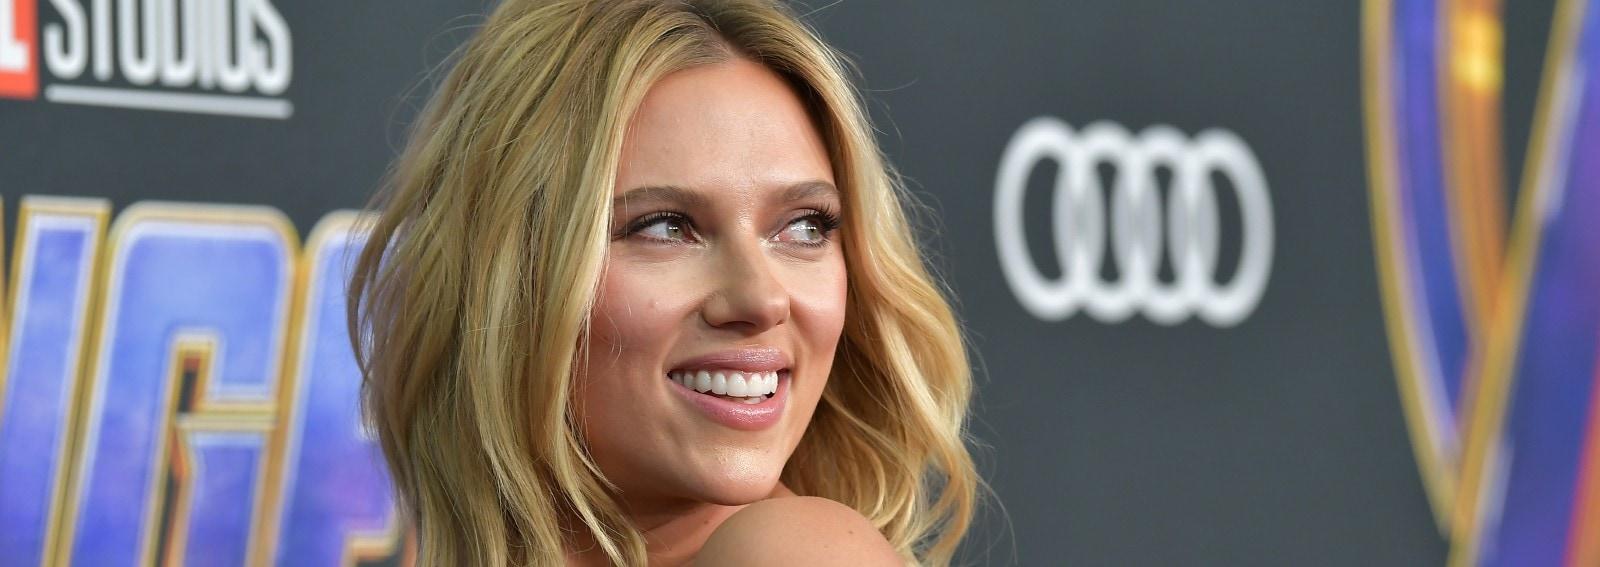 Scarlett Johansson hero